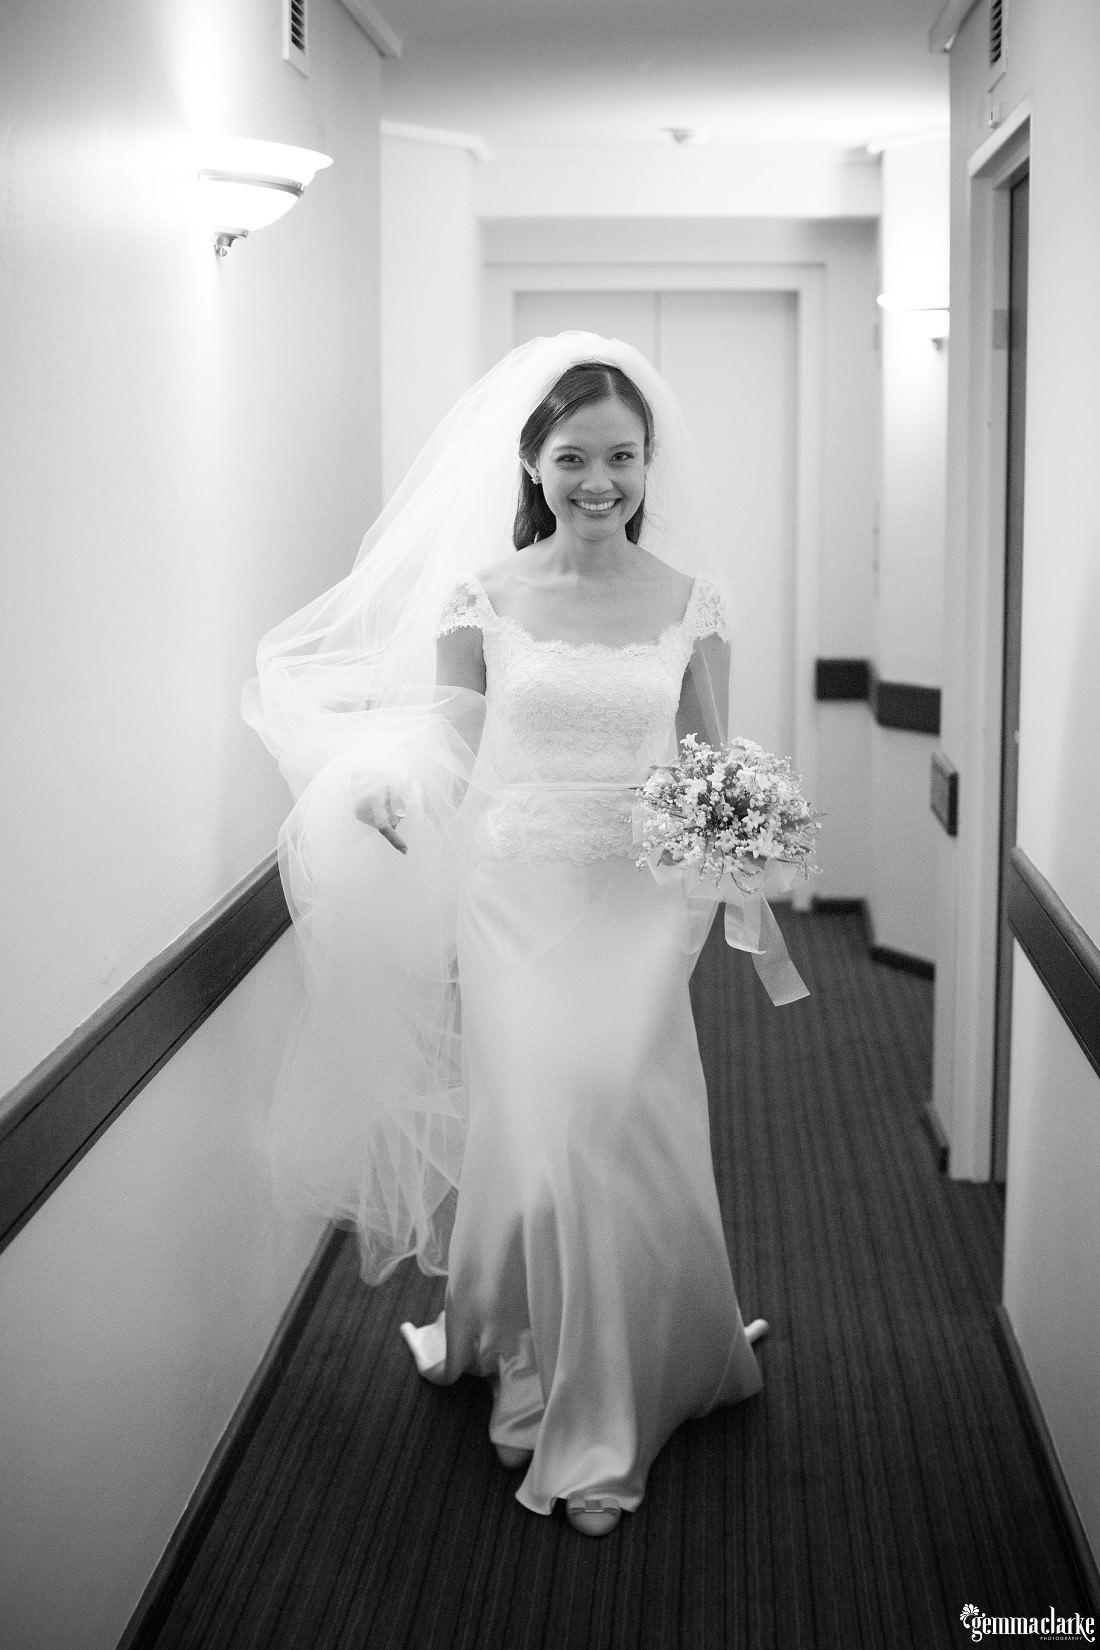 gemma-clarke-photography_parramatta-park-wedding-photos_old-government-house-reception_kamille-and-sam_0009